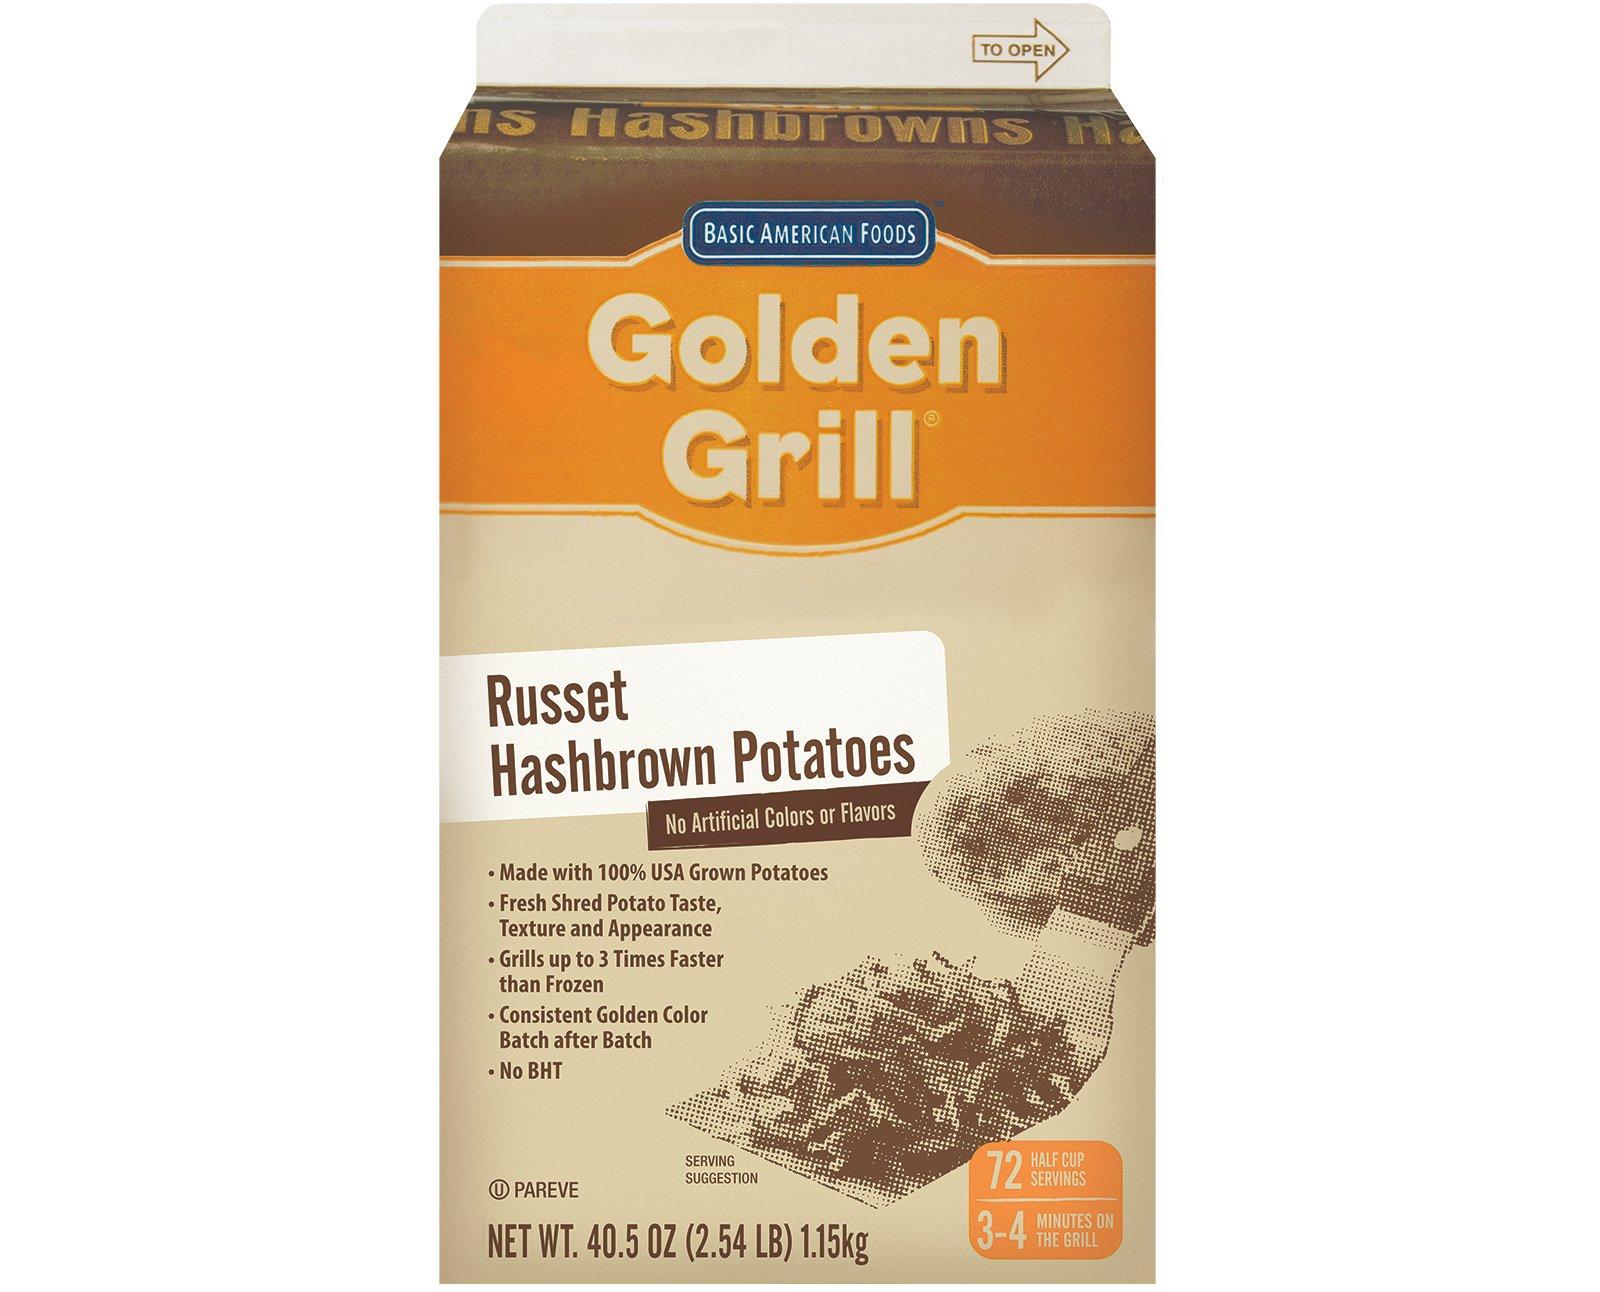 Golden Grill, Premium Hashbrown Potatoes, 432 servings, 40.5 oz. (6 Count)